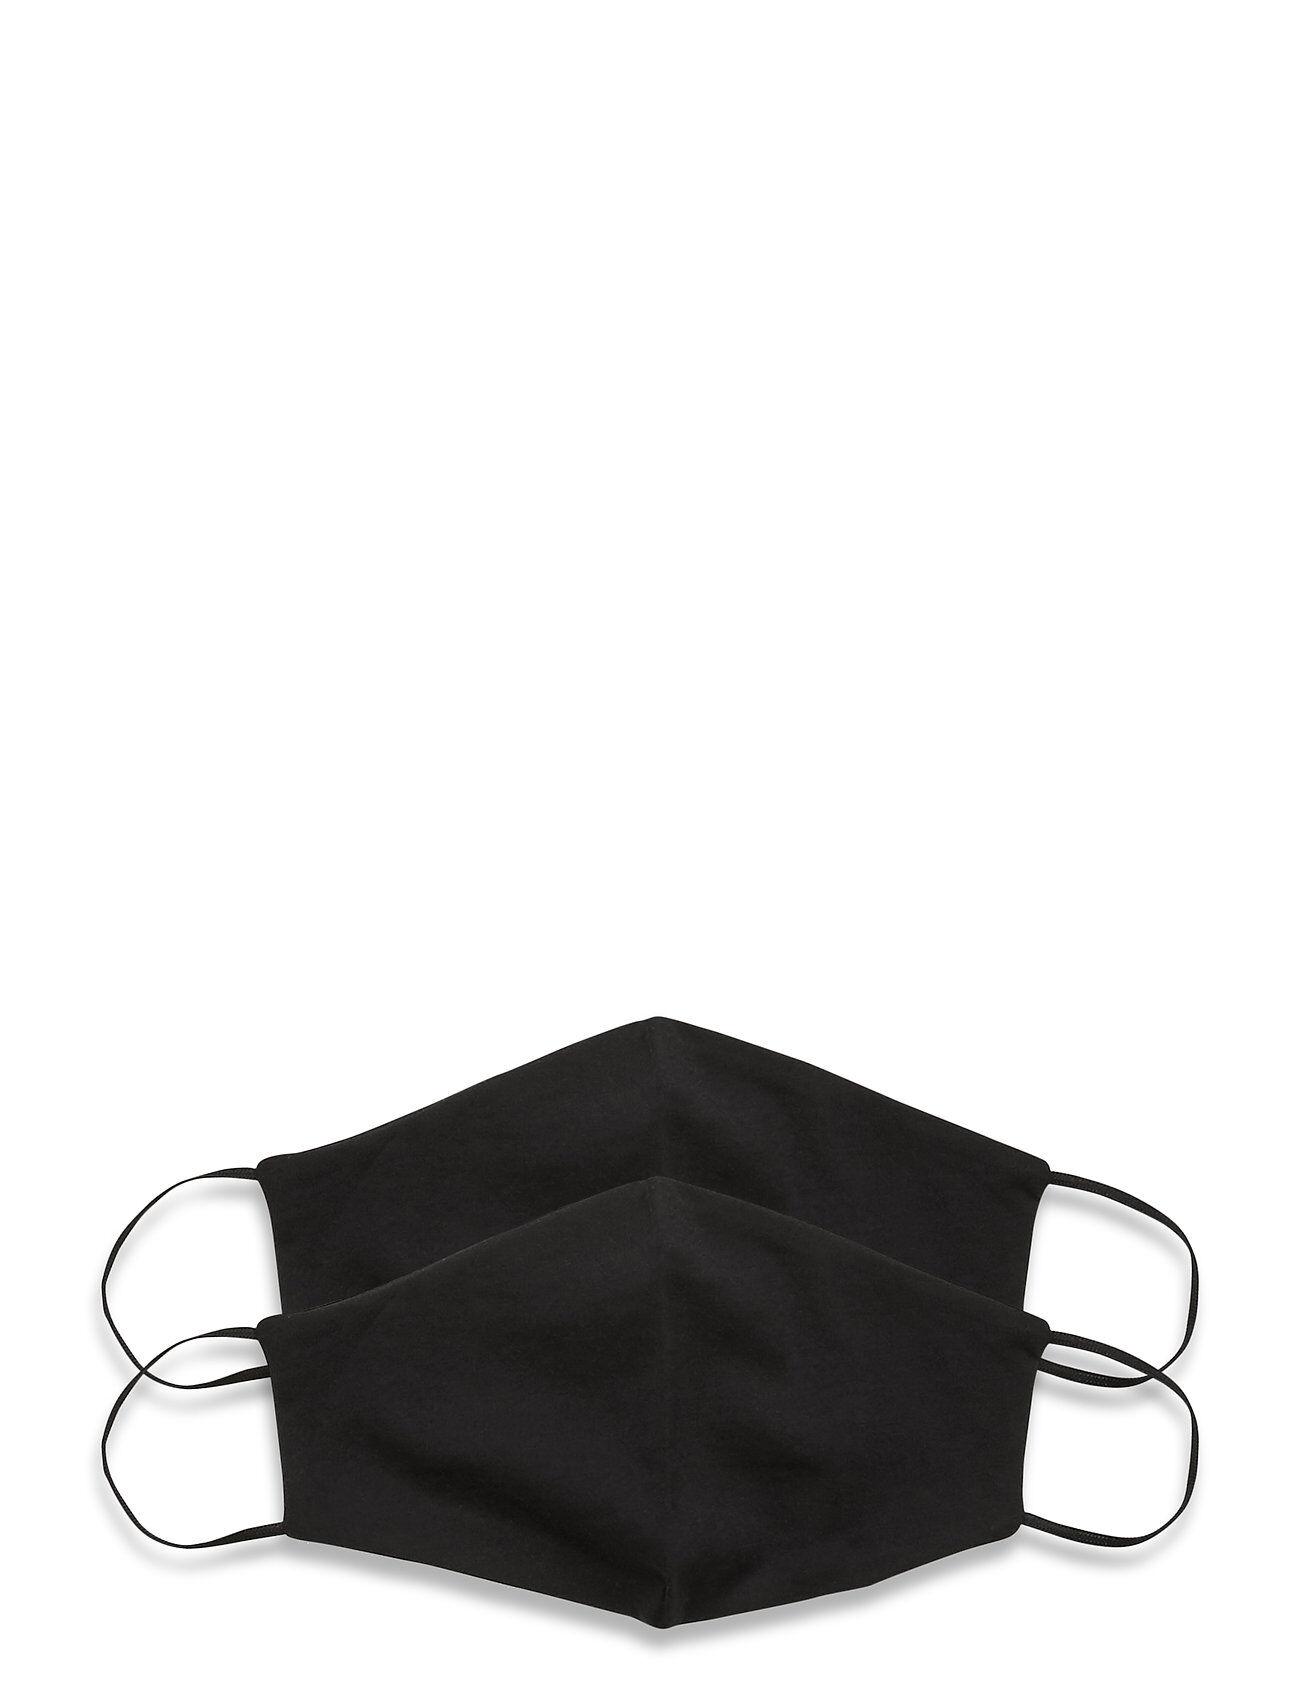 ORAS24 Reusable Face Mask 2 Pack Accessories Face Masks Musta ORAS24